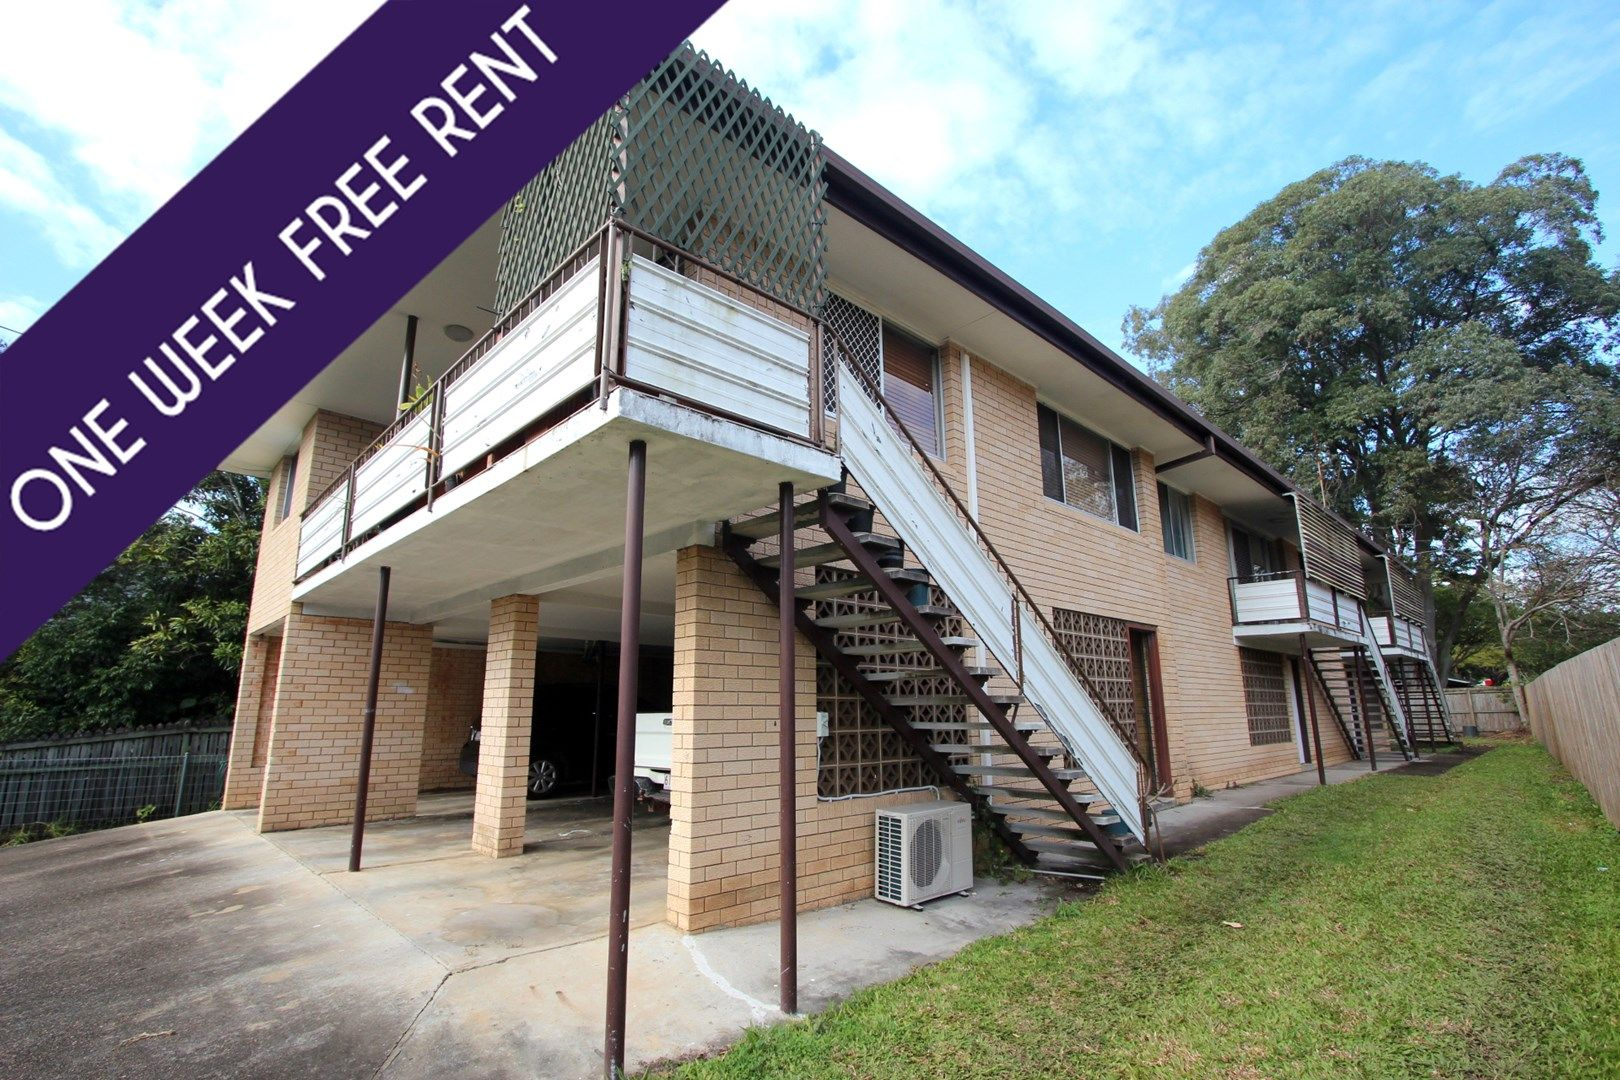 2/21 Harty Street, Coorparoo QLD 4151, Image 0